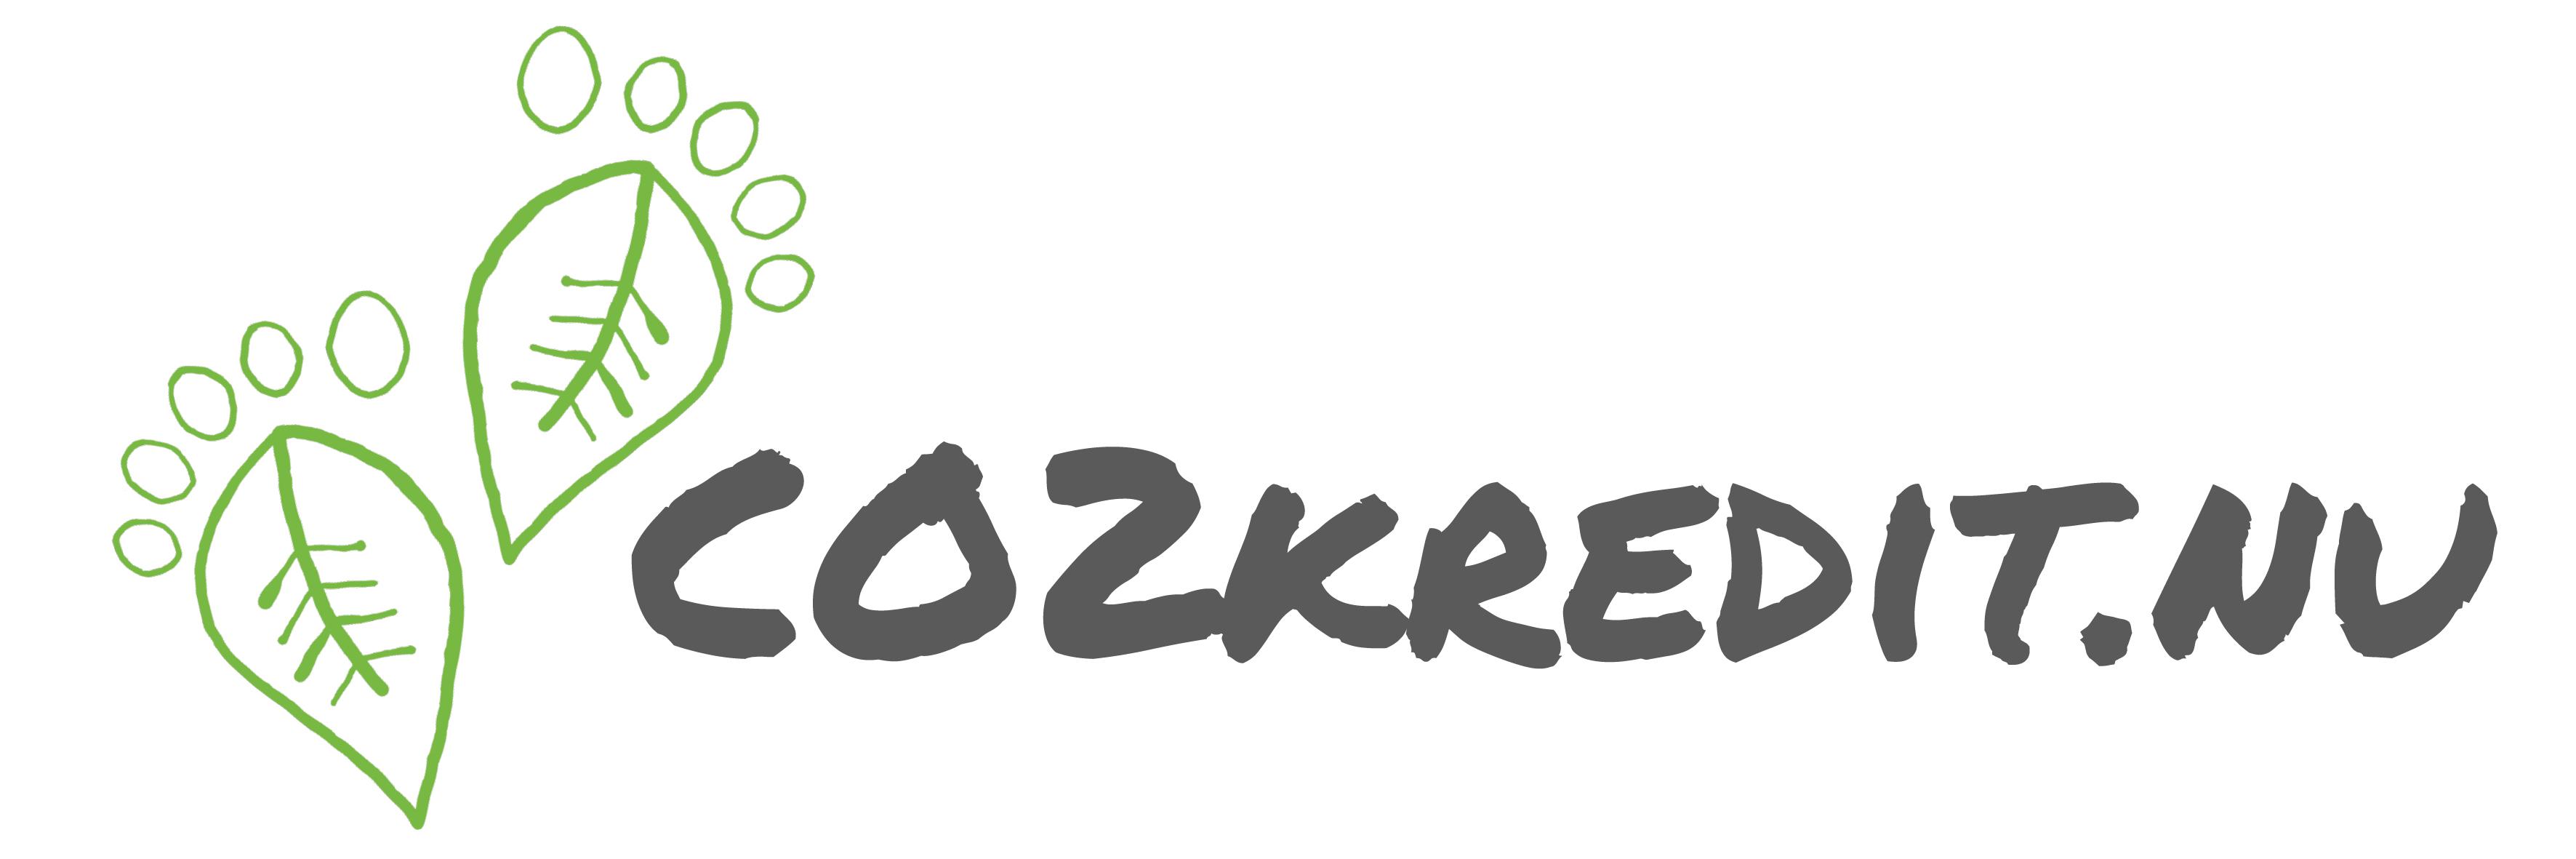 CO2kredit.nu_logo1_RGB